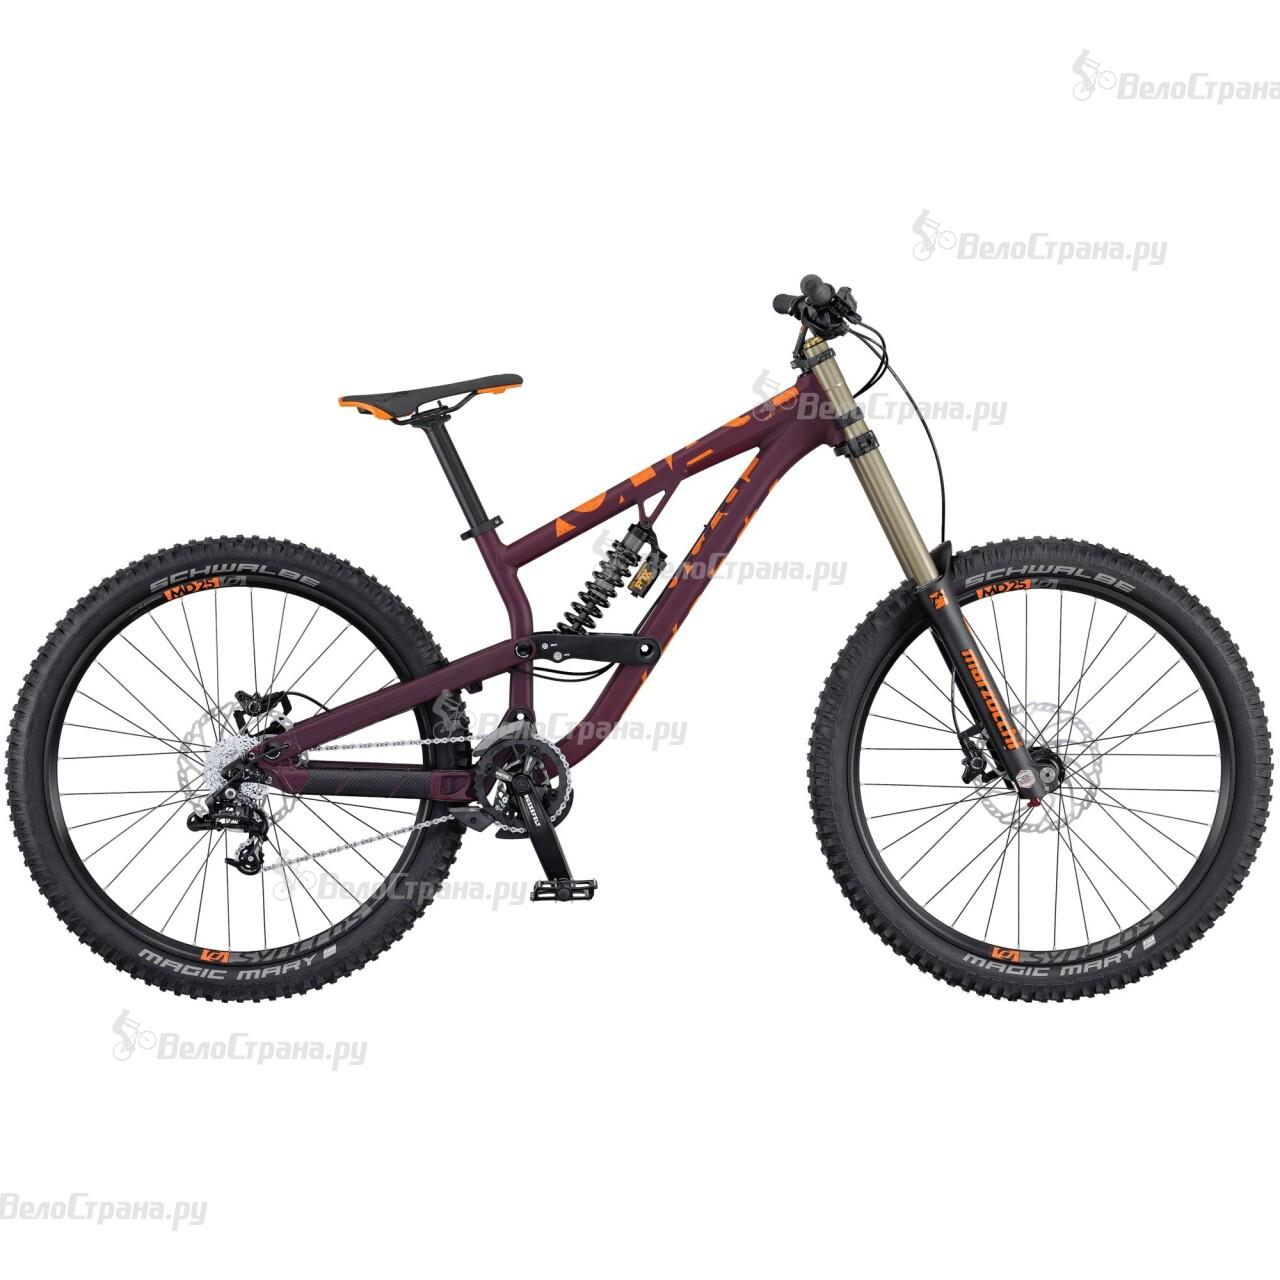 Велосипед Scott Voltage FR 720 (2016)